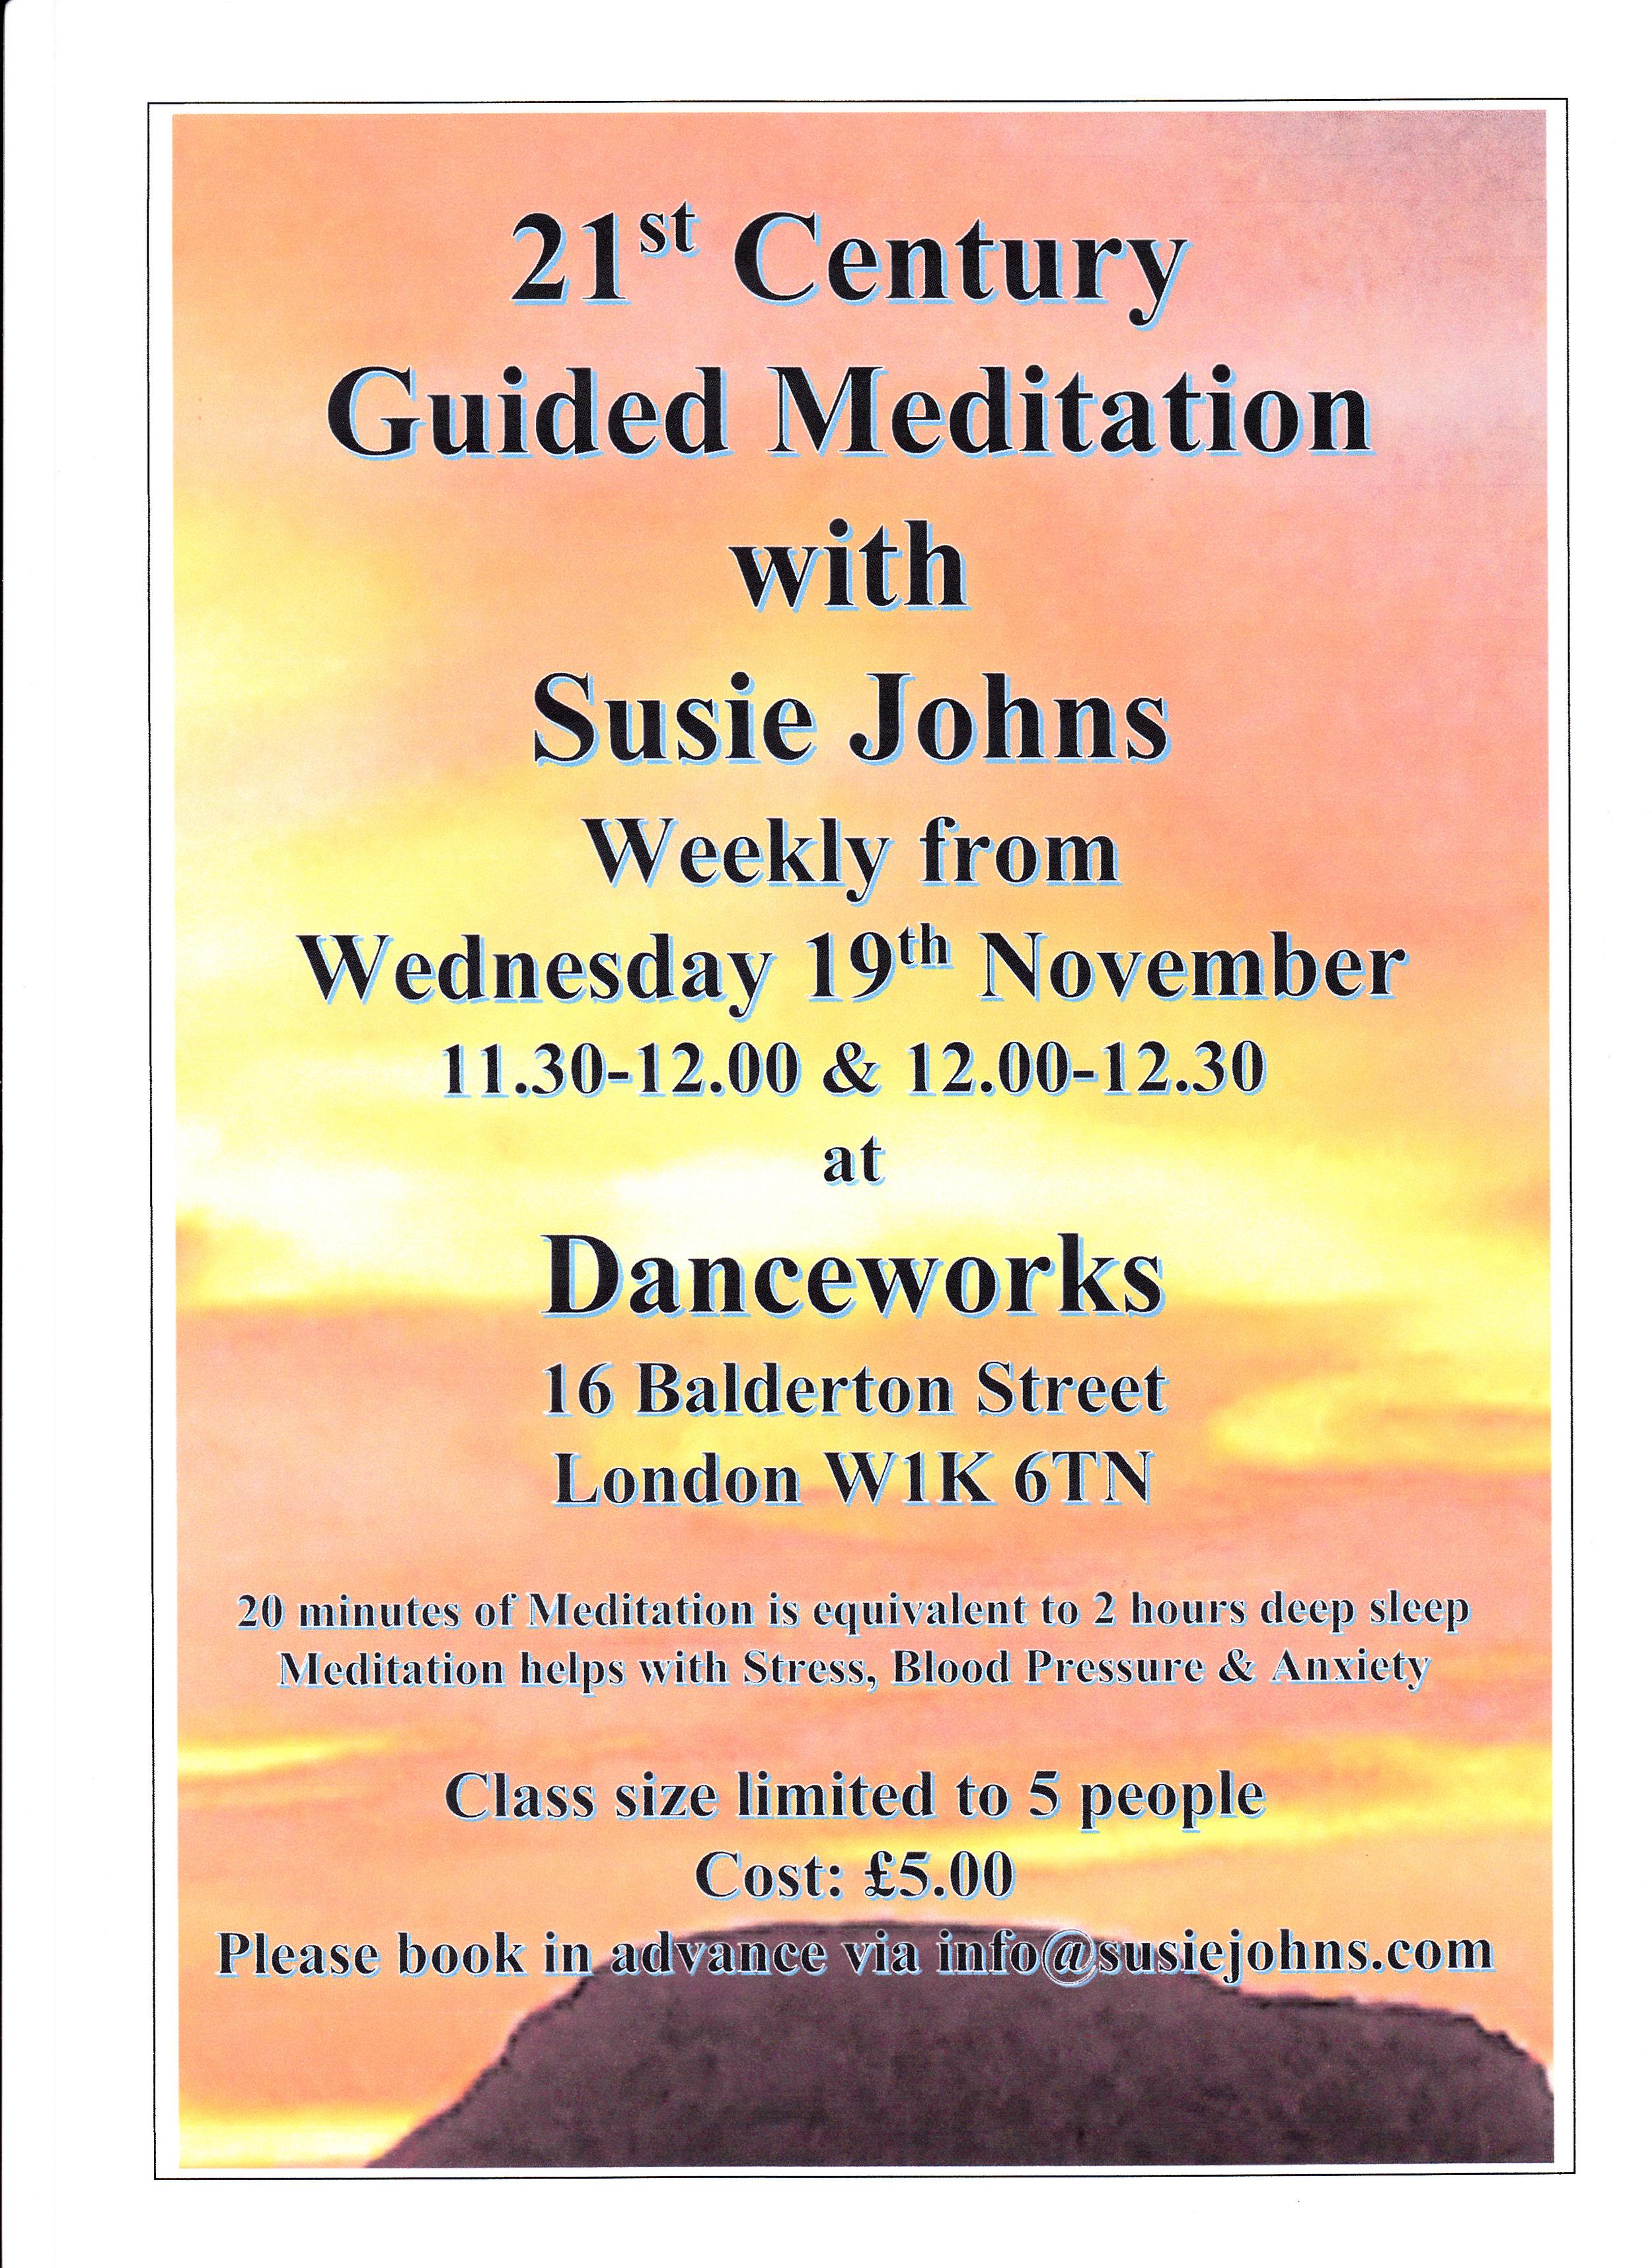 Danceworks Meditation Poster